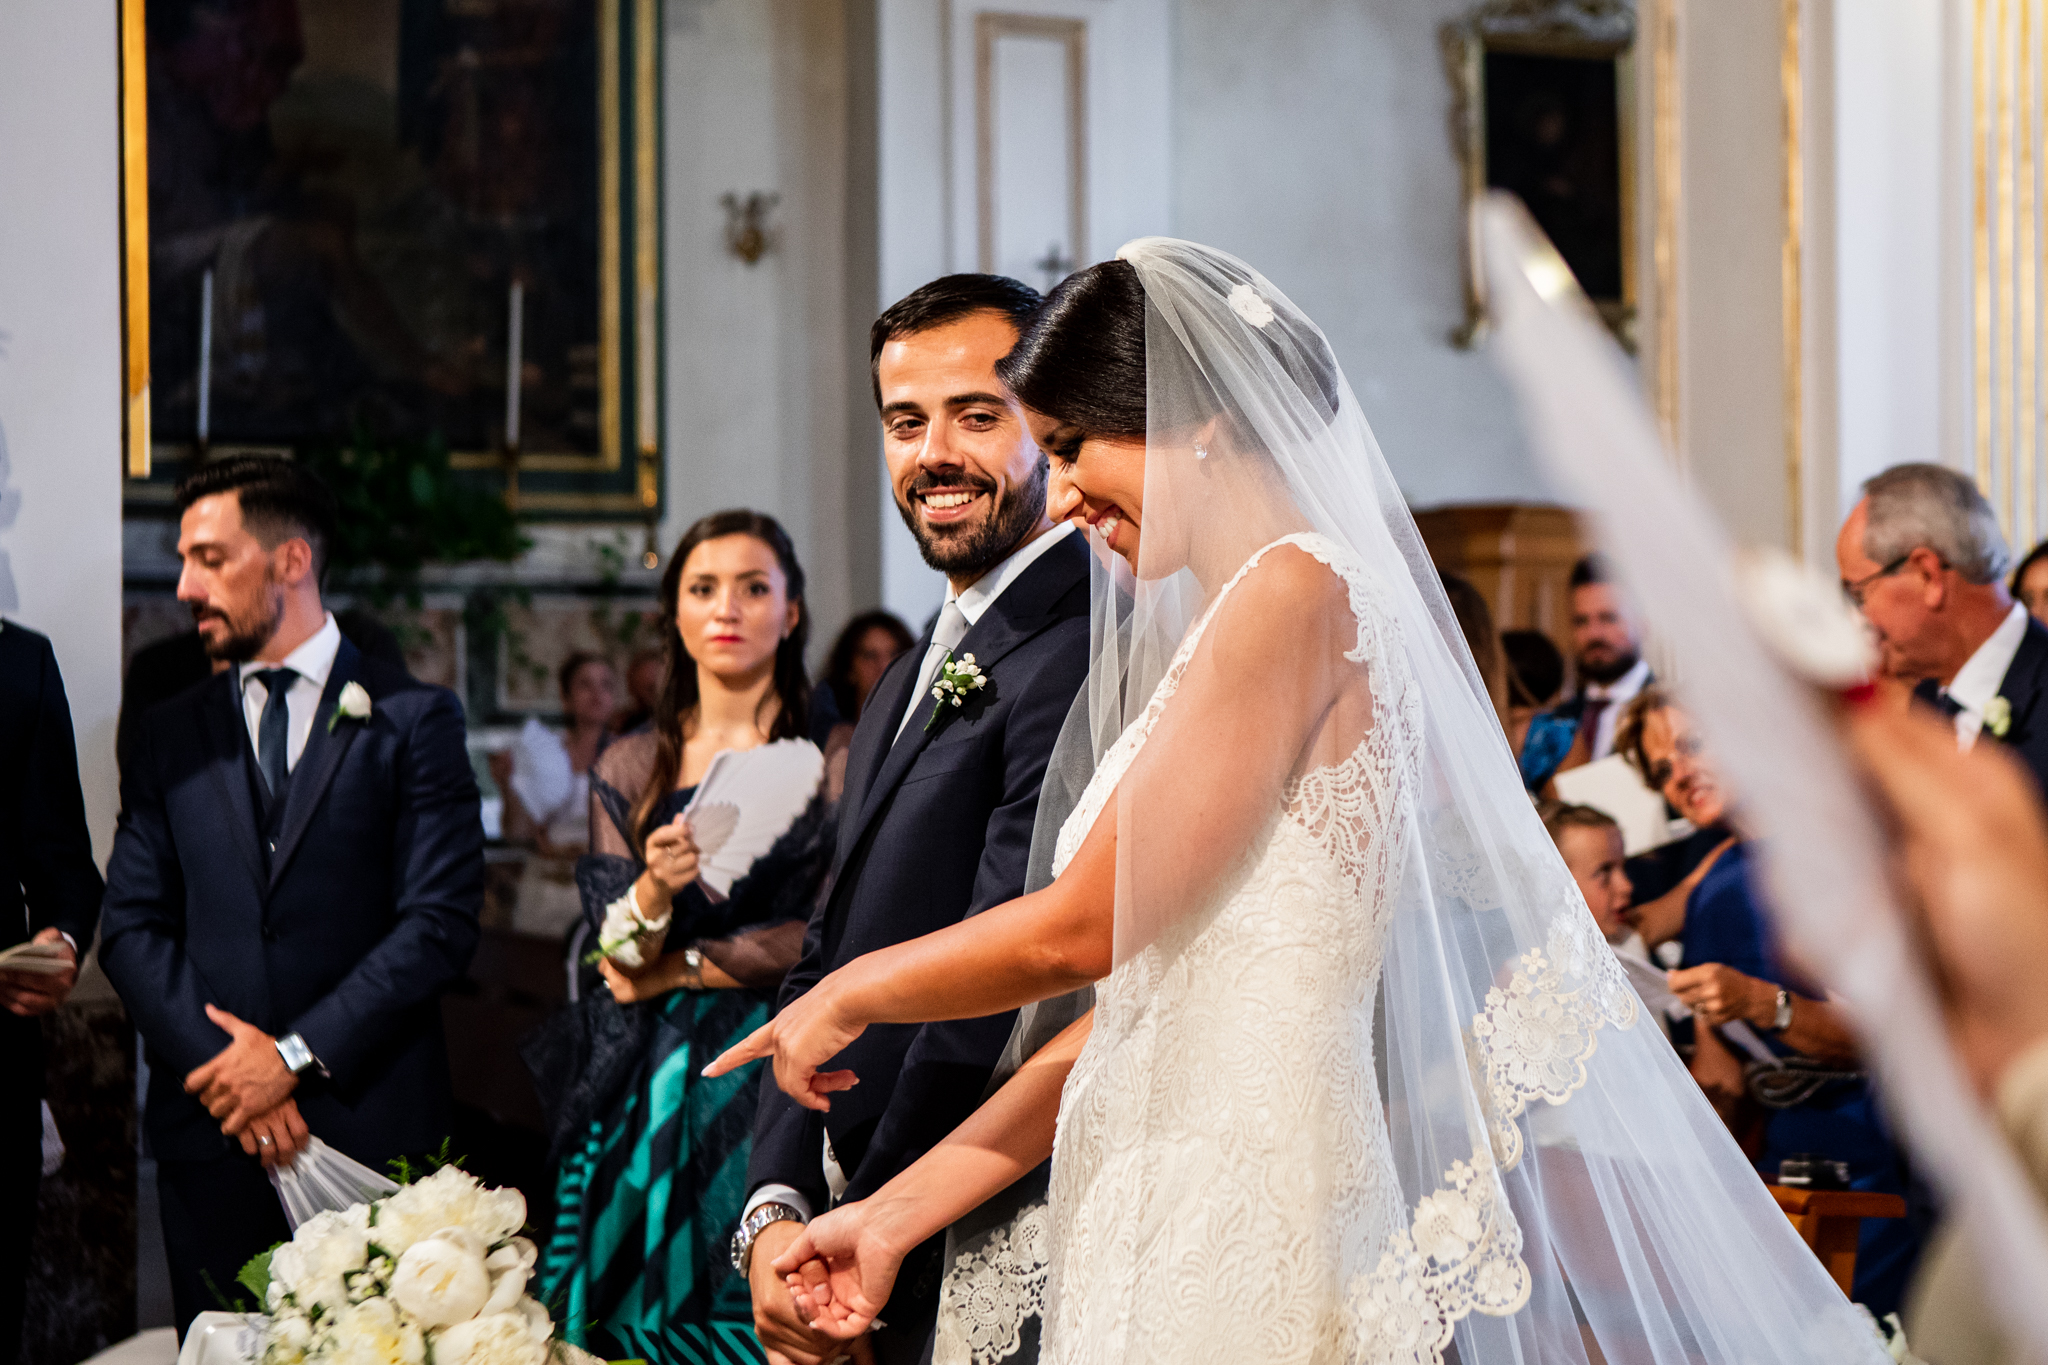 Best-wedding-photographer-in-Sicily- Catania-22.jpg